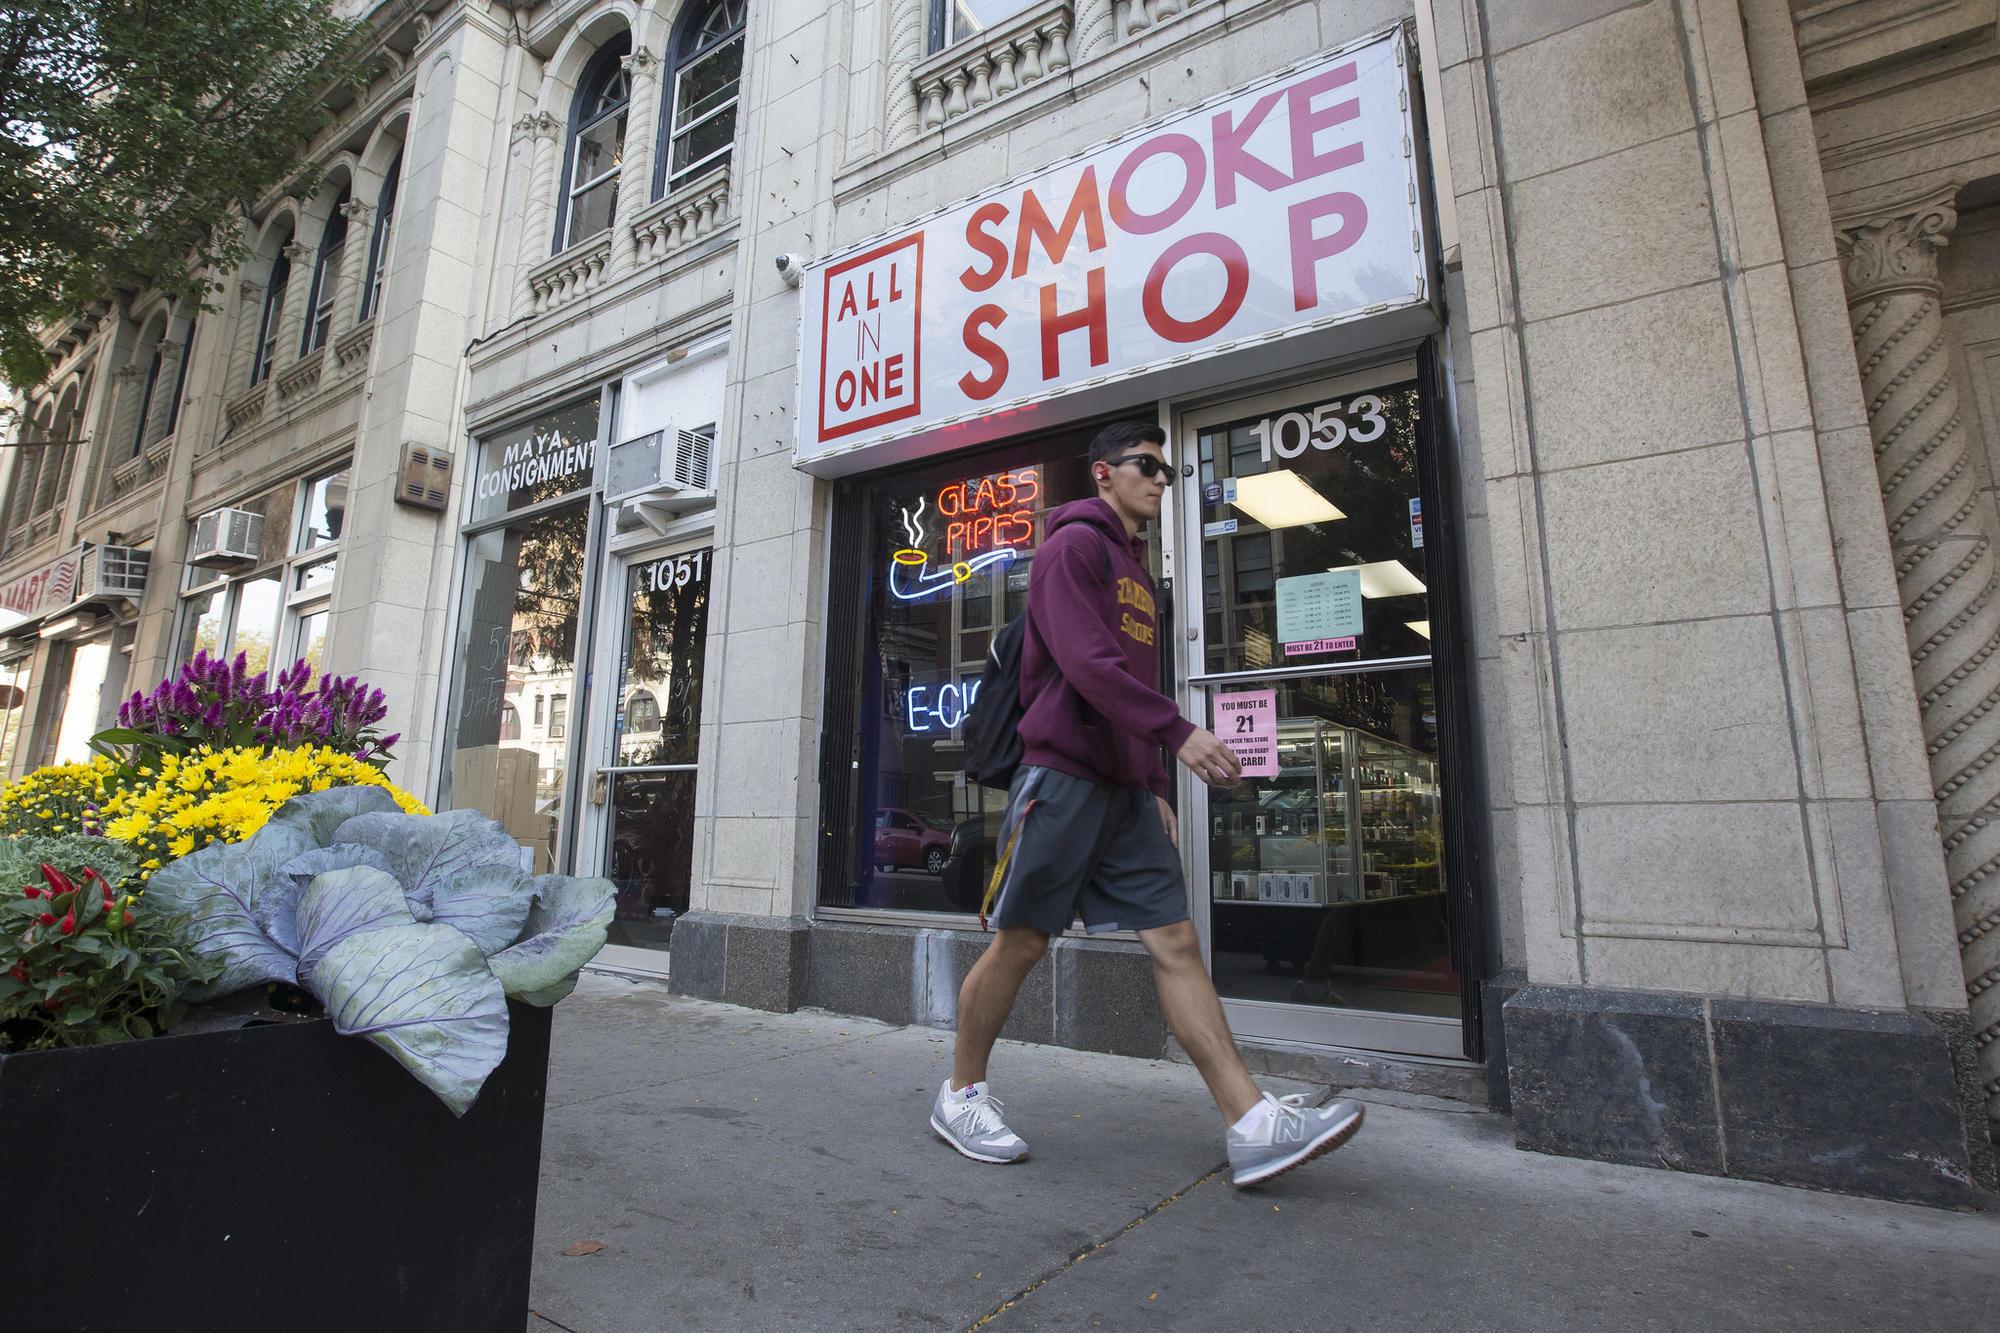 Tobacco at 21 - Baltimore Sun